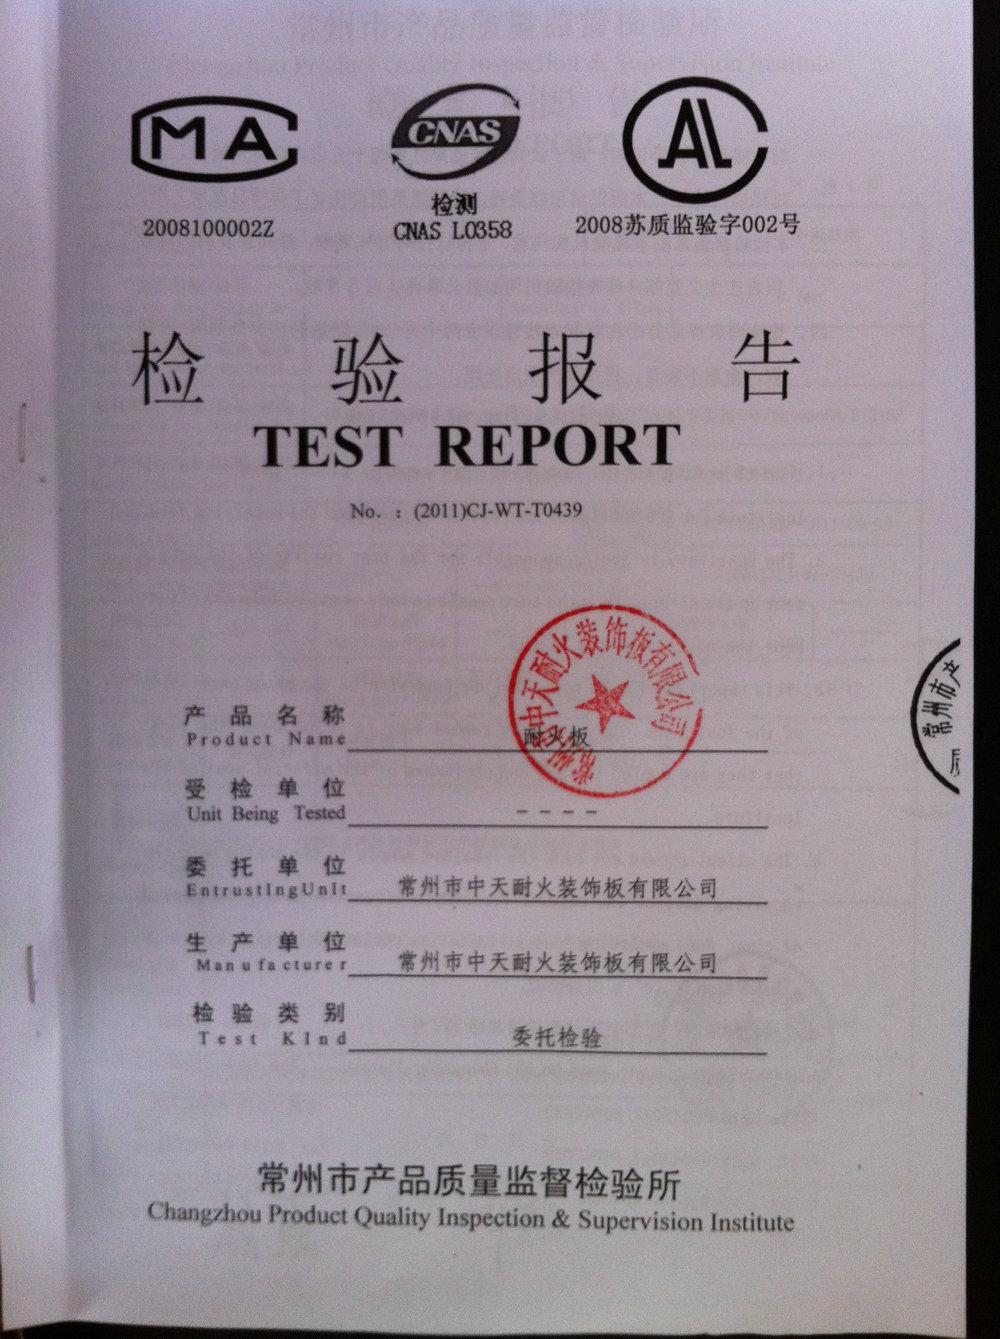 hpl test report 1